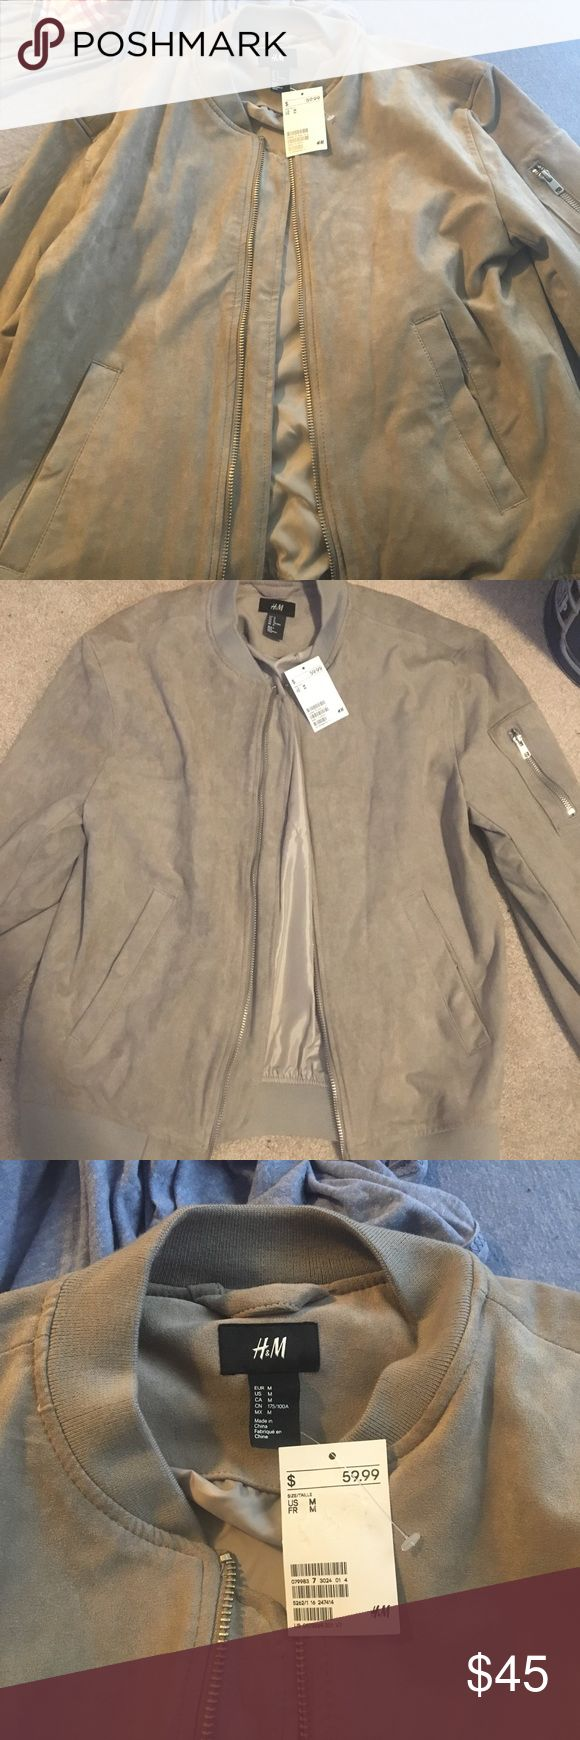 H&M bomber jacket Bomber jacket, Jackets, H&m jackets